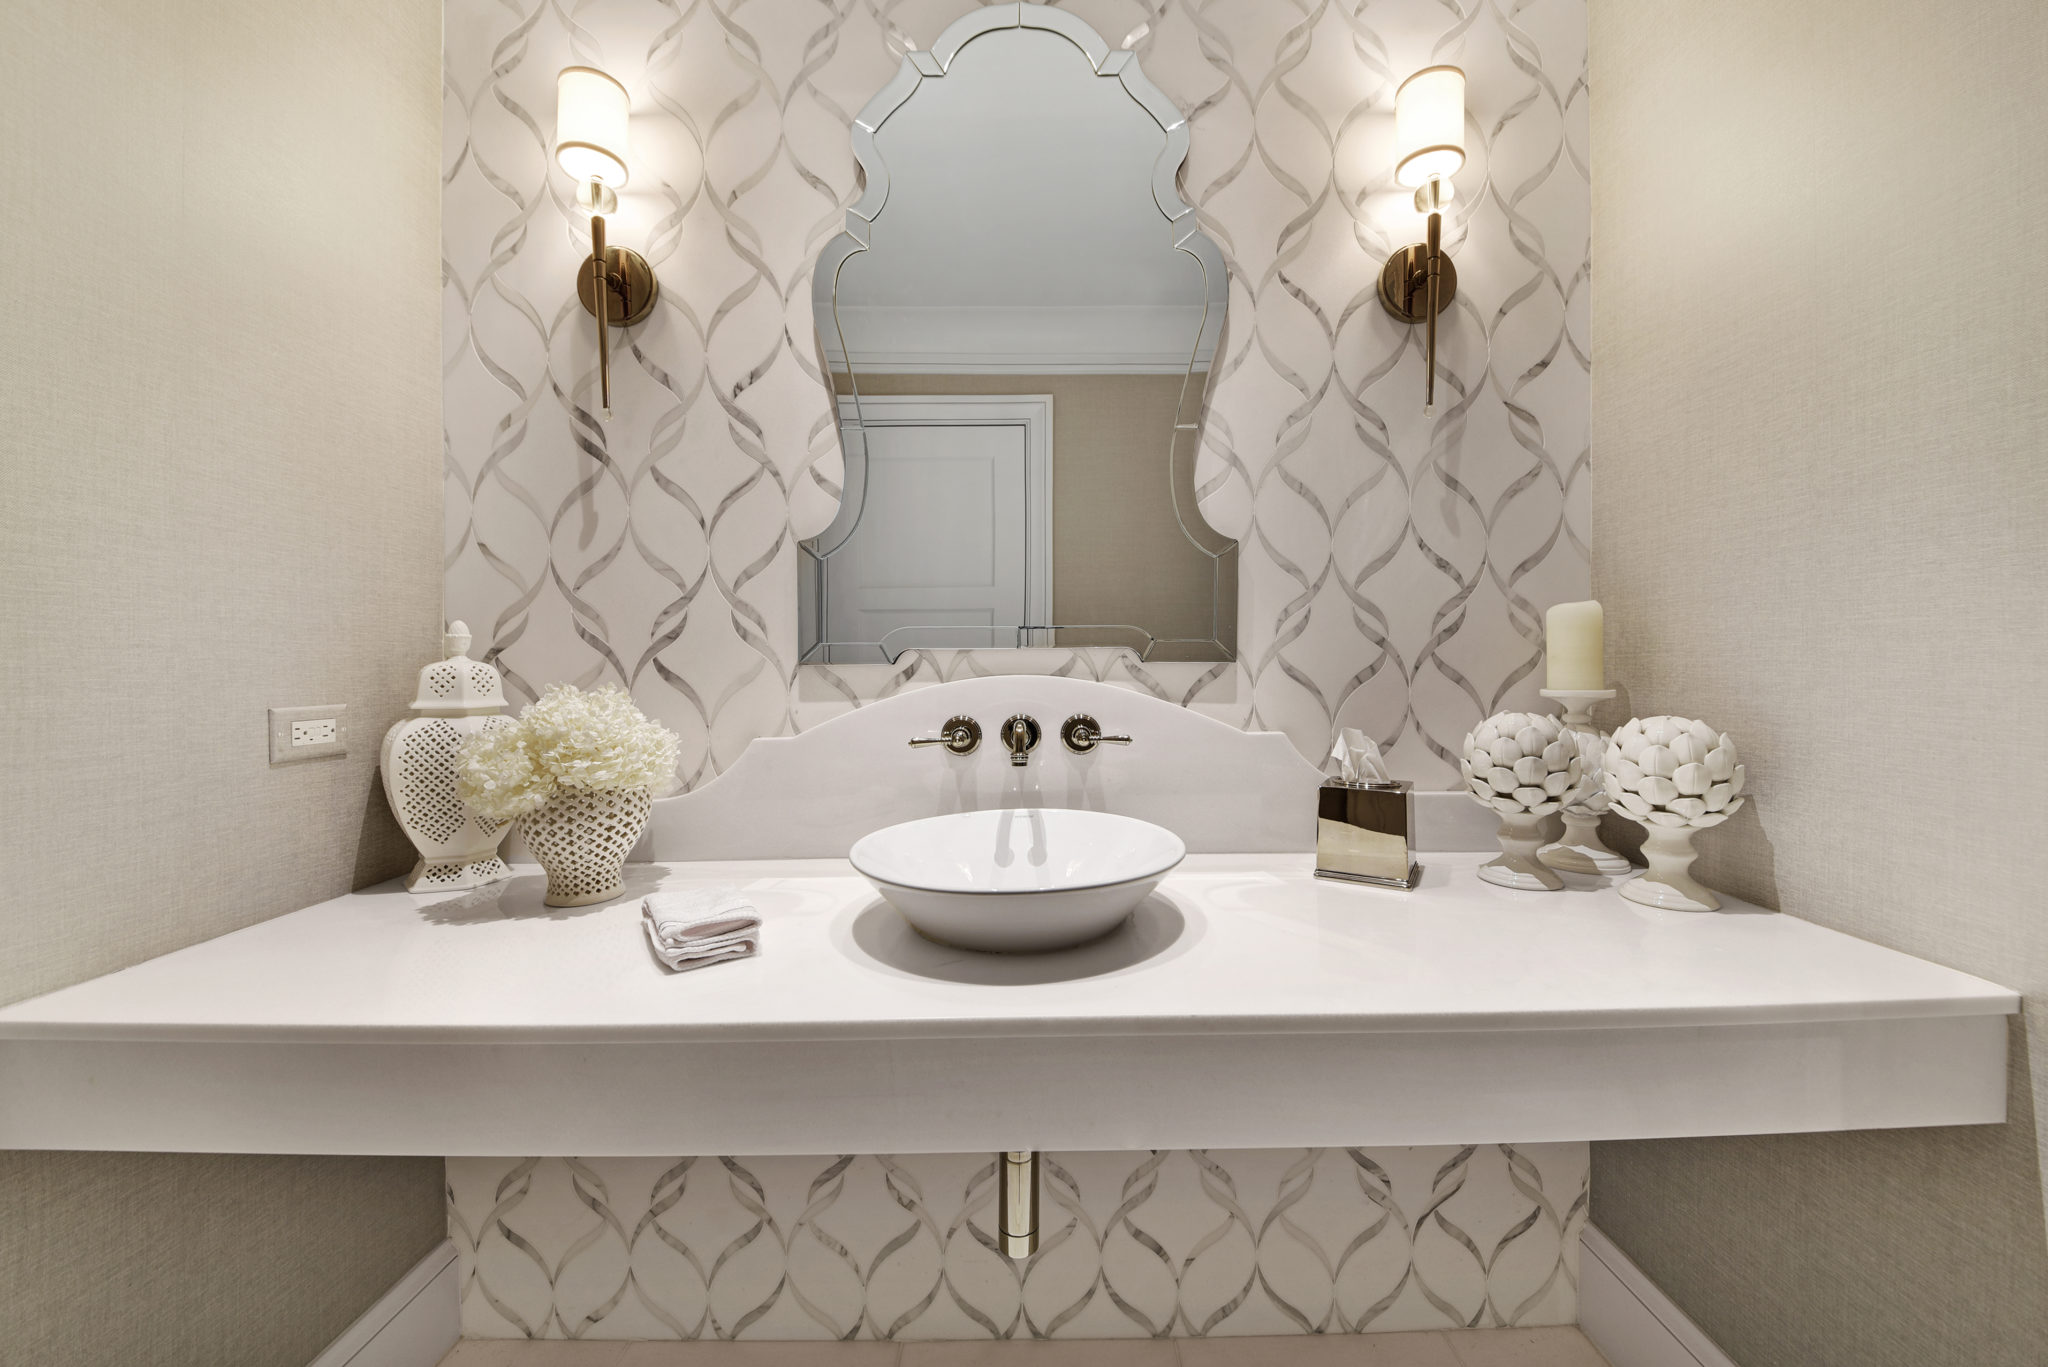 Delray Beach, FL Residence 10 - Architectural Design Studios